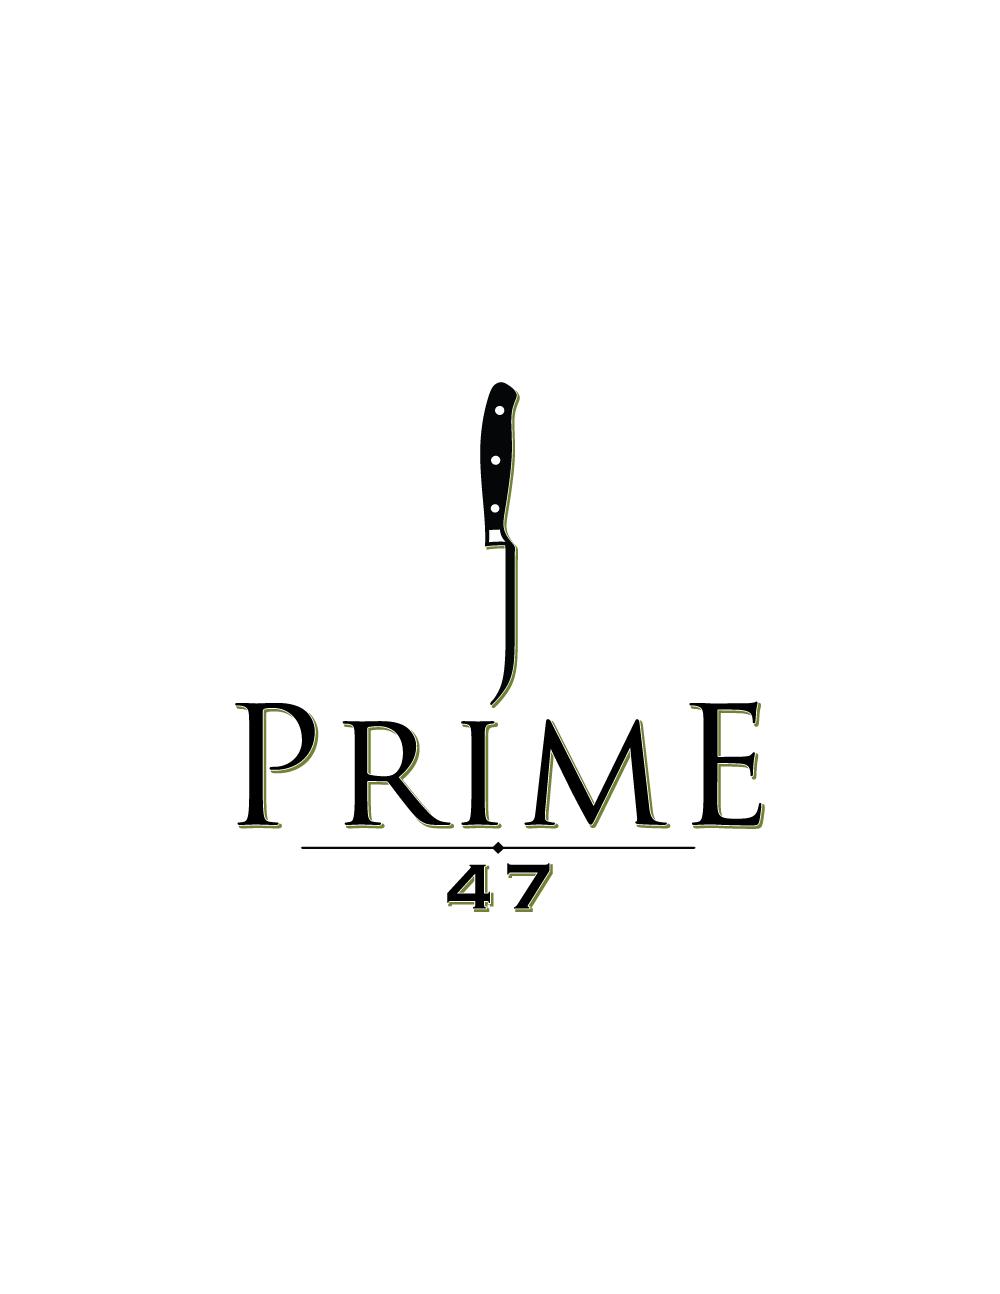 Prime 47 FINAL LOGO.jpg